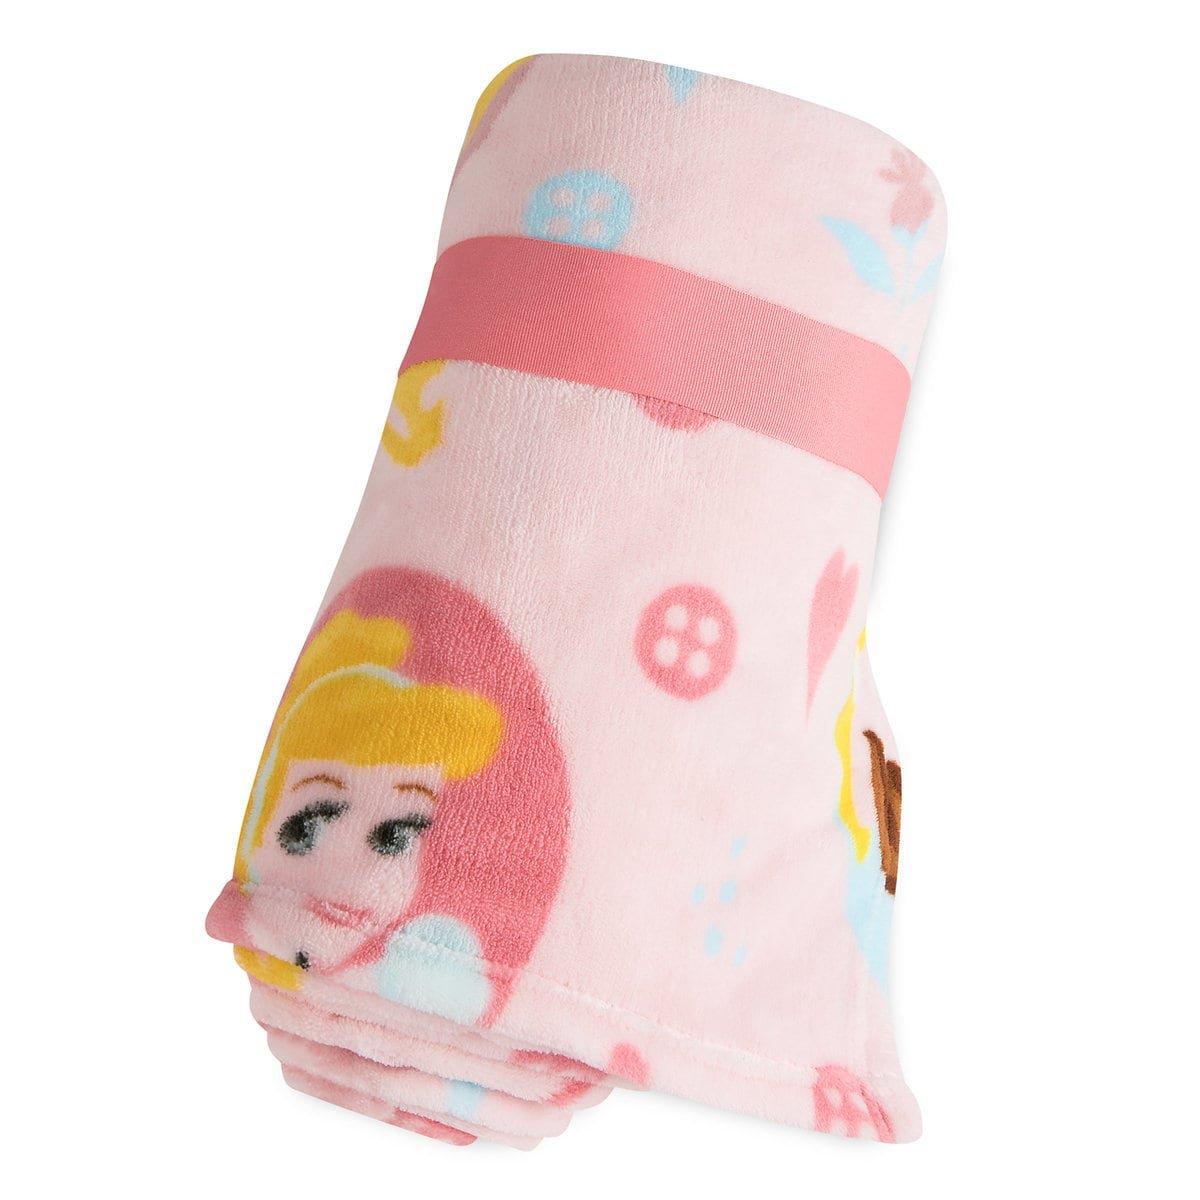 Disney Store Princess Belle Cinderella Sleeping Beauty  Pink Fleece Throw Blanket 2018